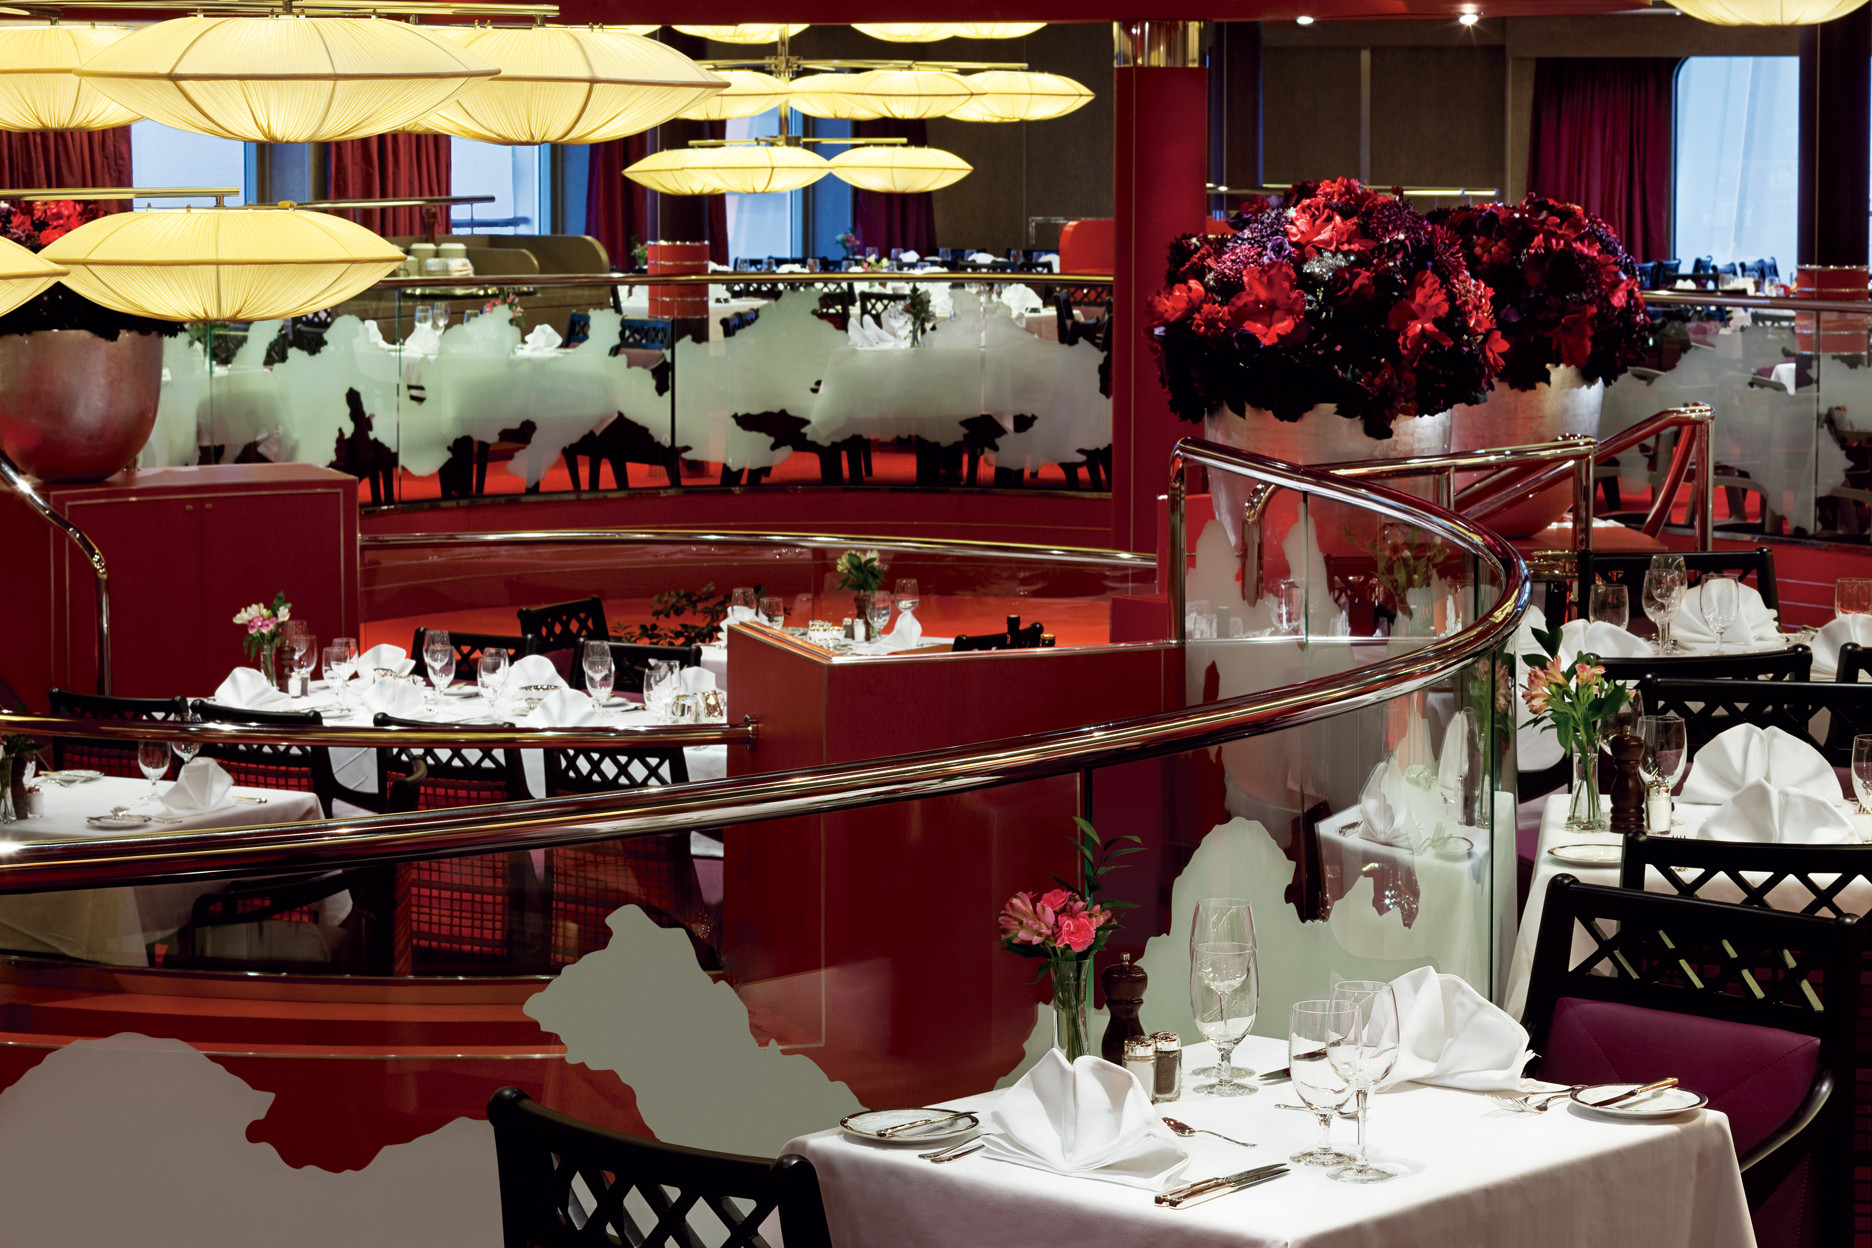 Holland America Line Nieuw Amsterdam Interior Restaurant.jpg